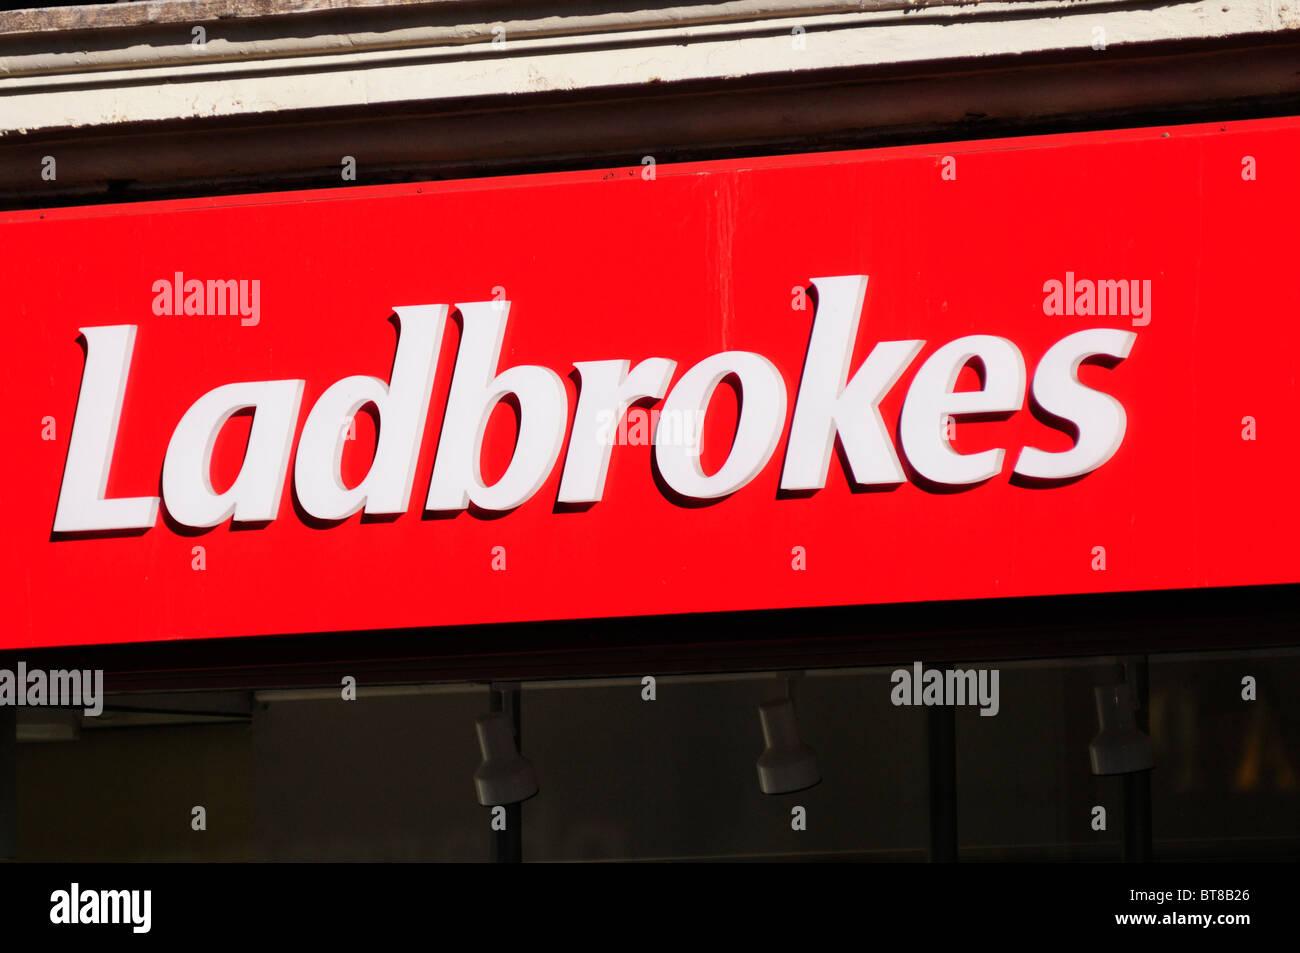 Ladbrokes betting shop sign symbol logo, London, England, UK